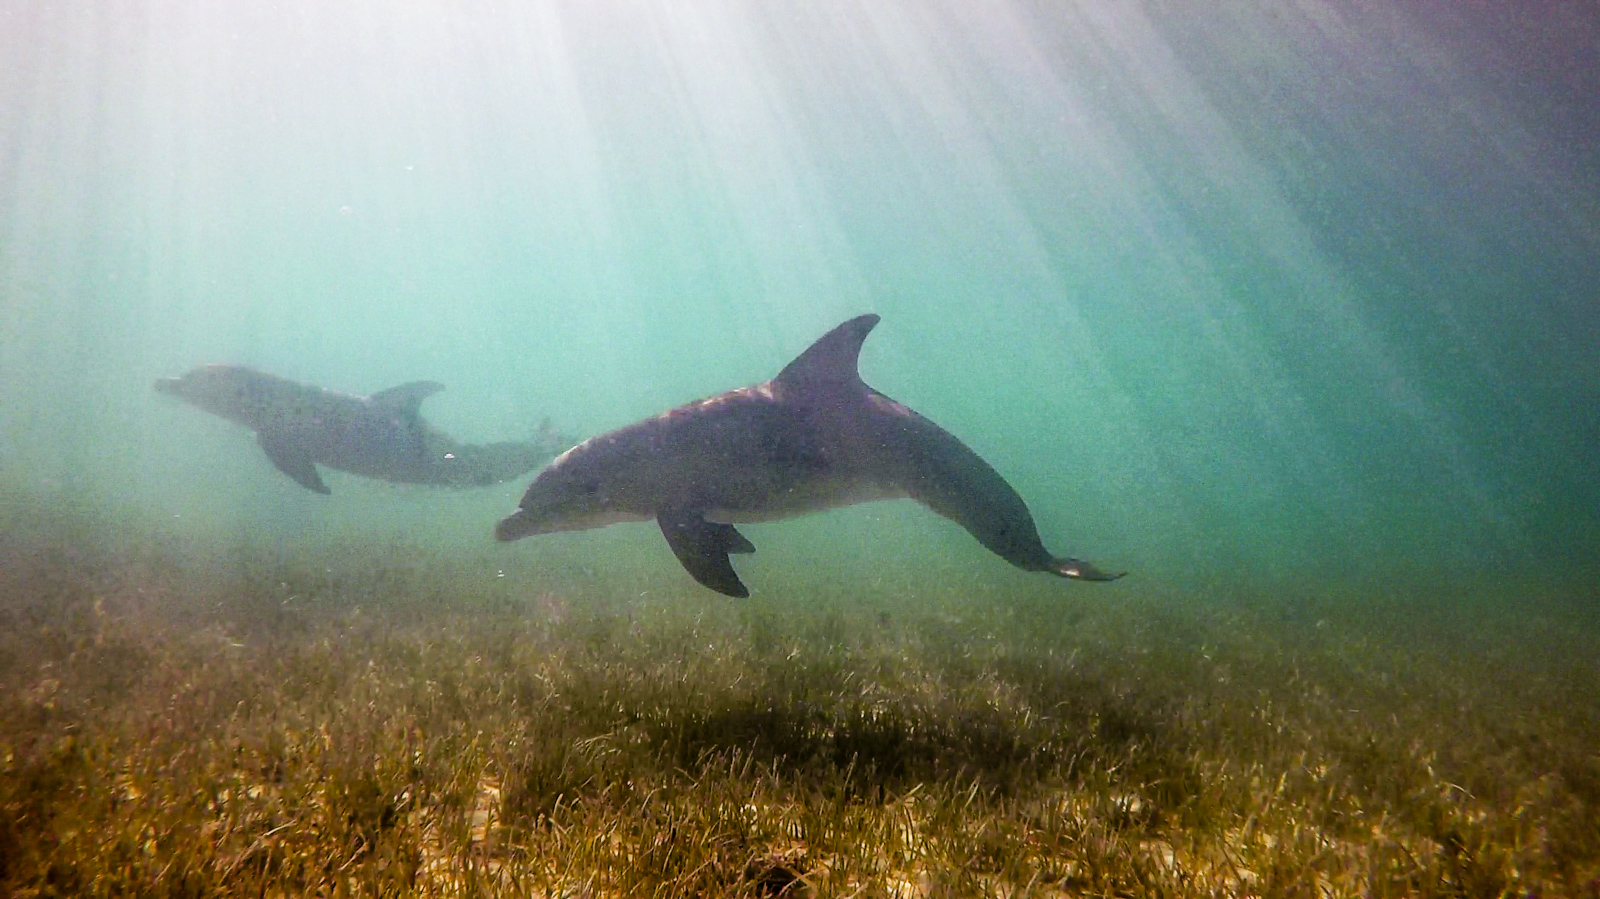 Dolphin photos by Zack.